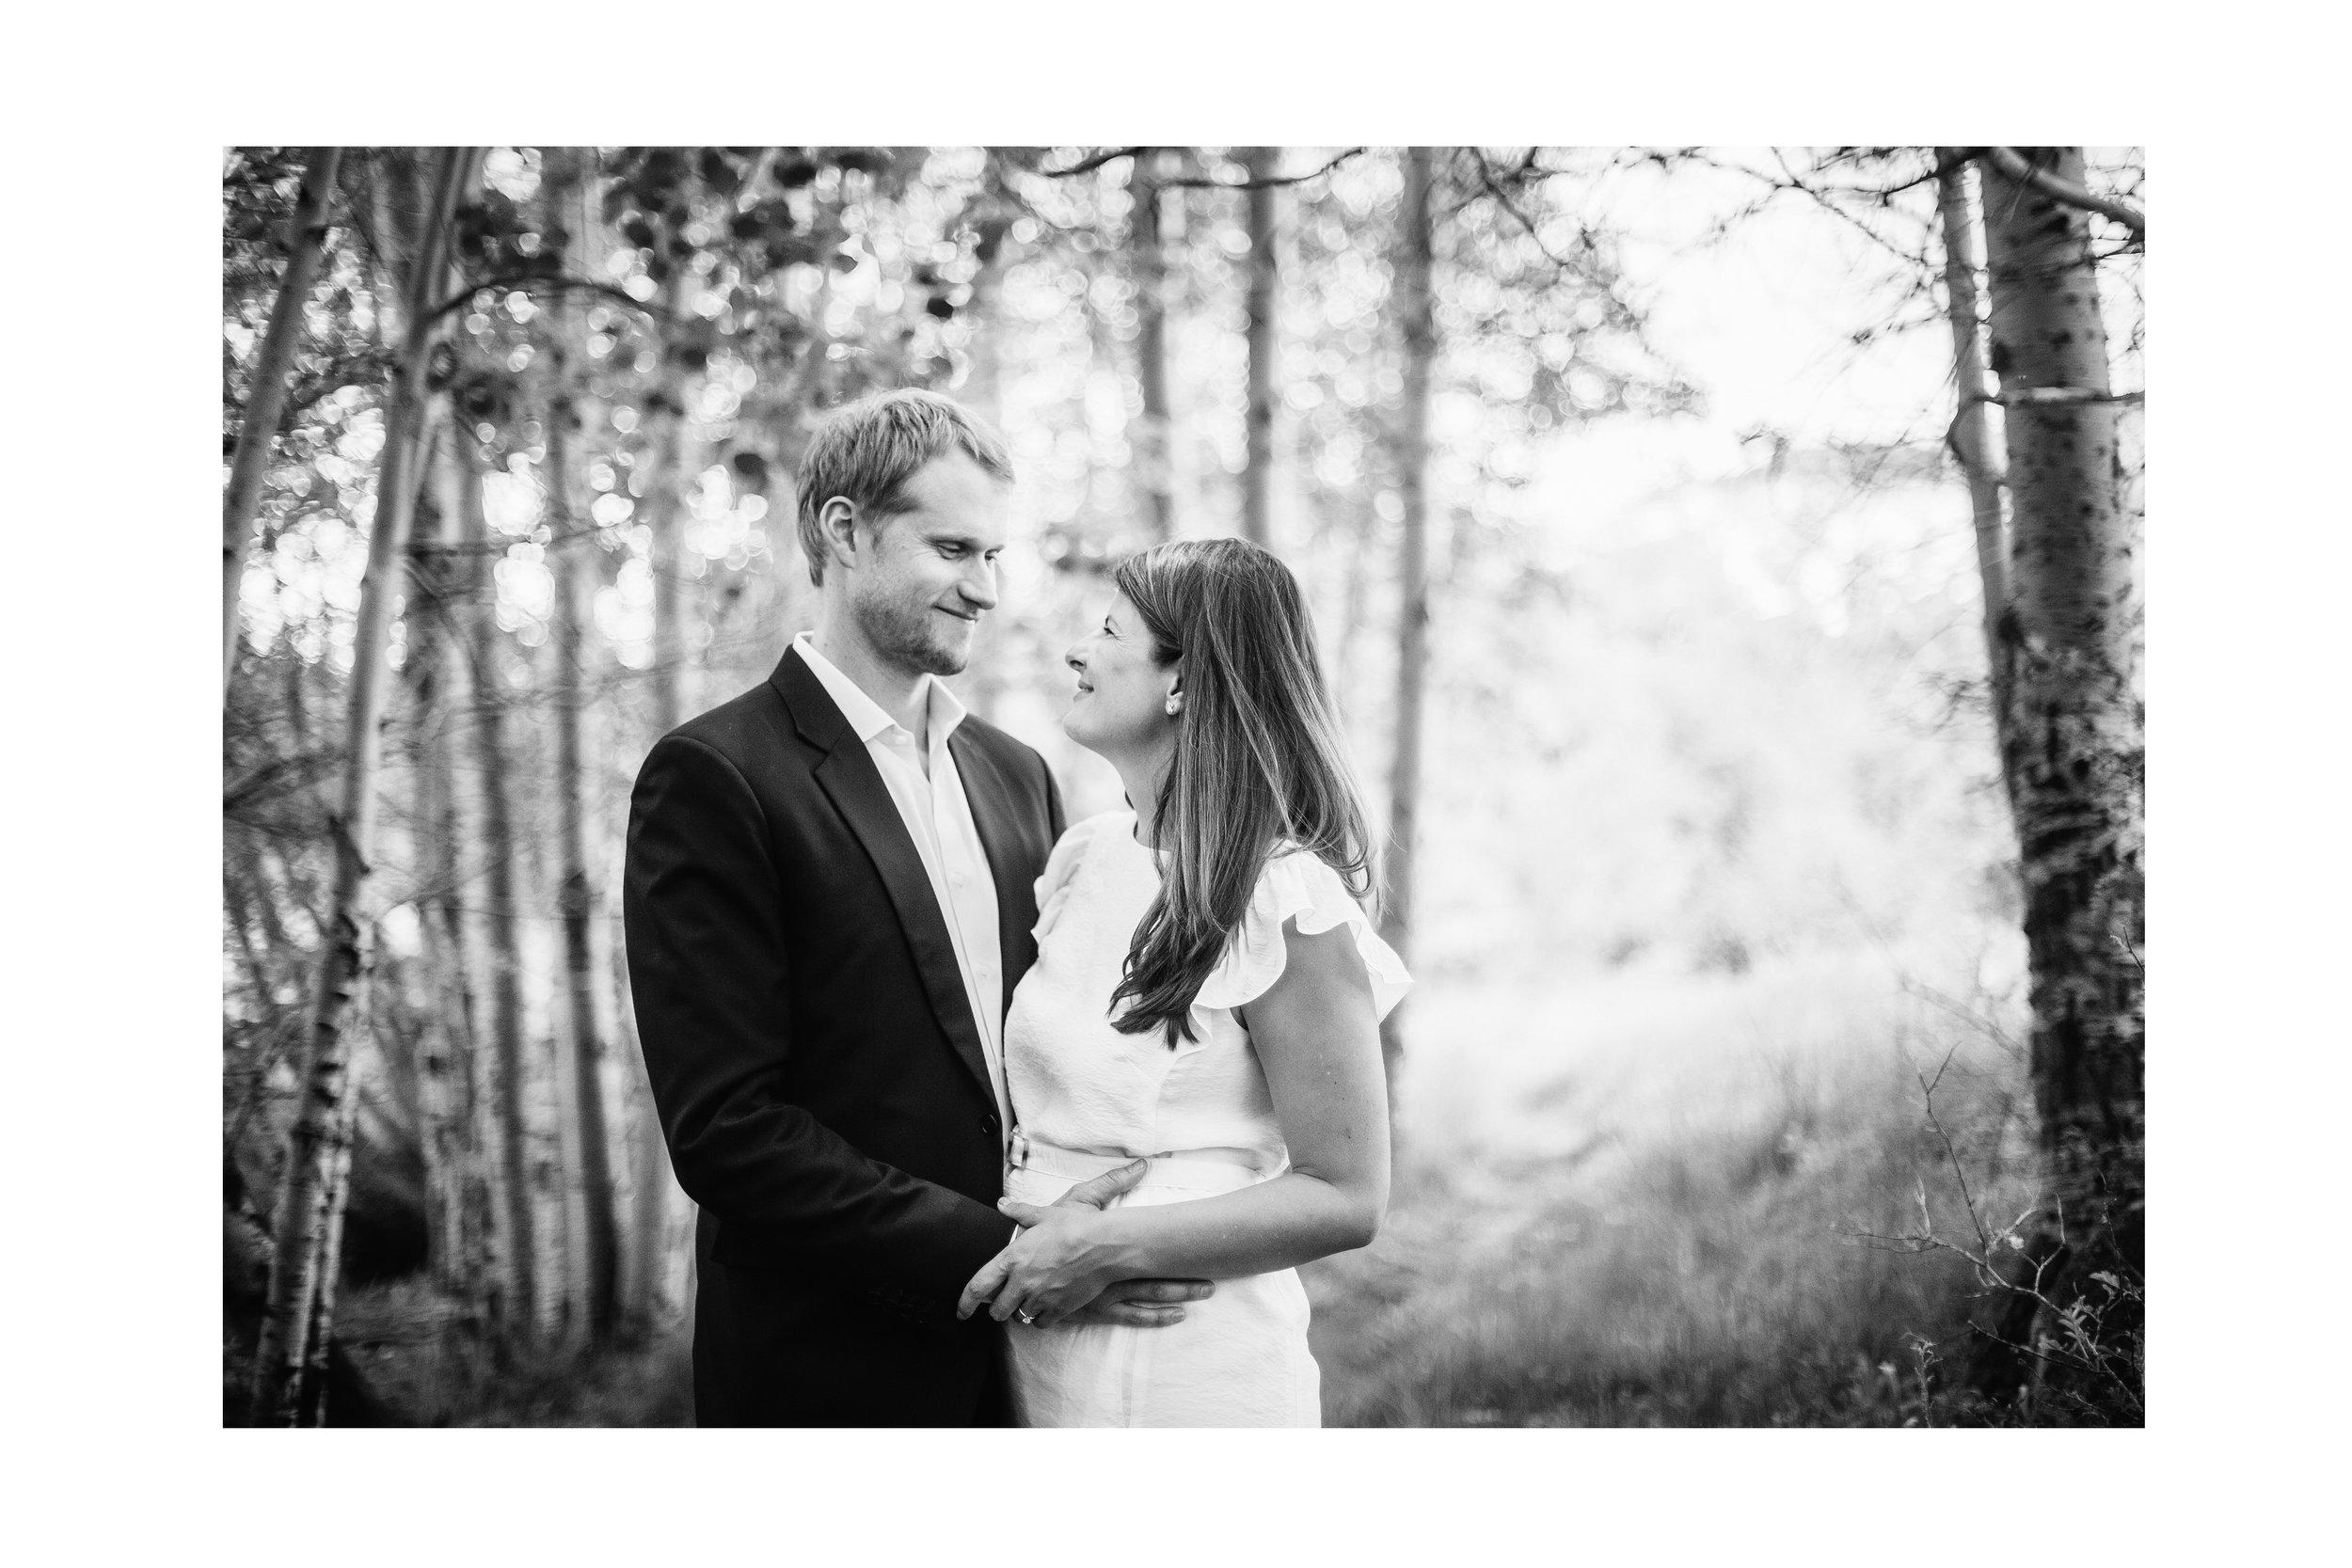 Melisa&David_Wedding_Day_011.jpg